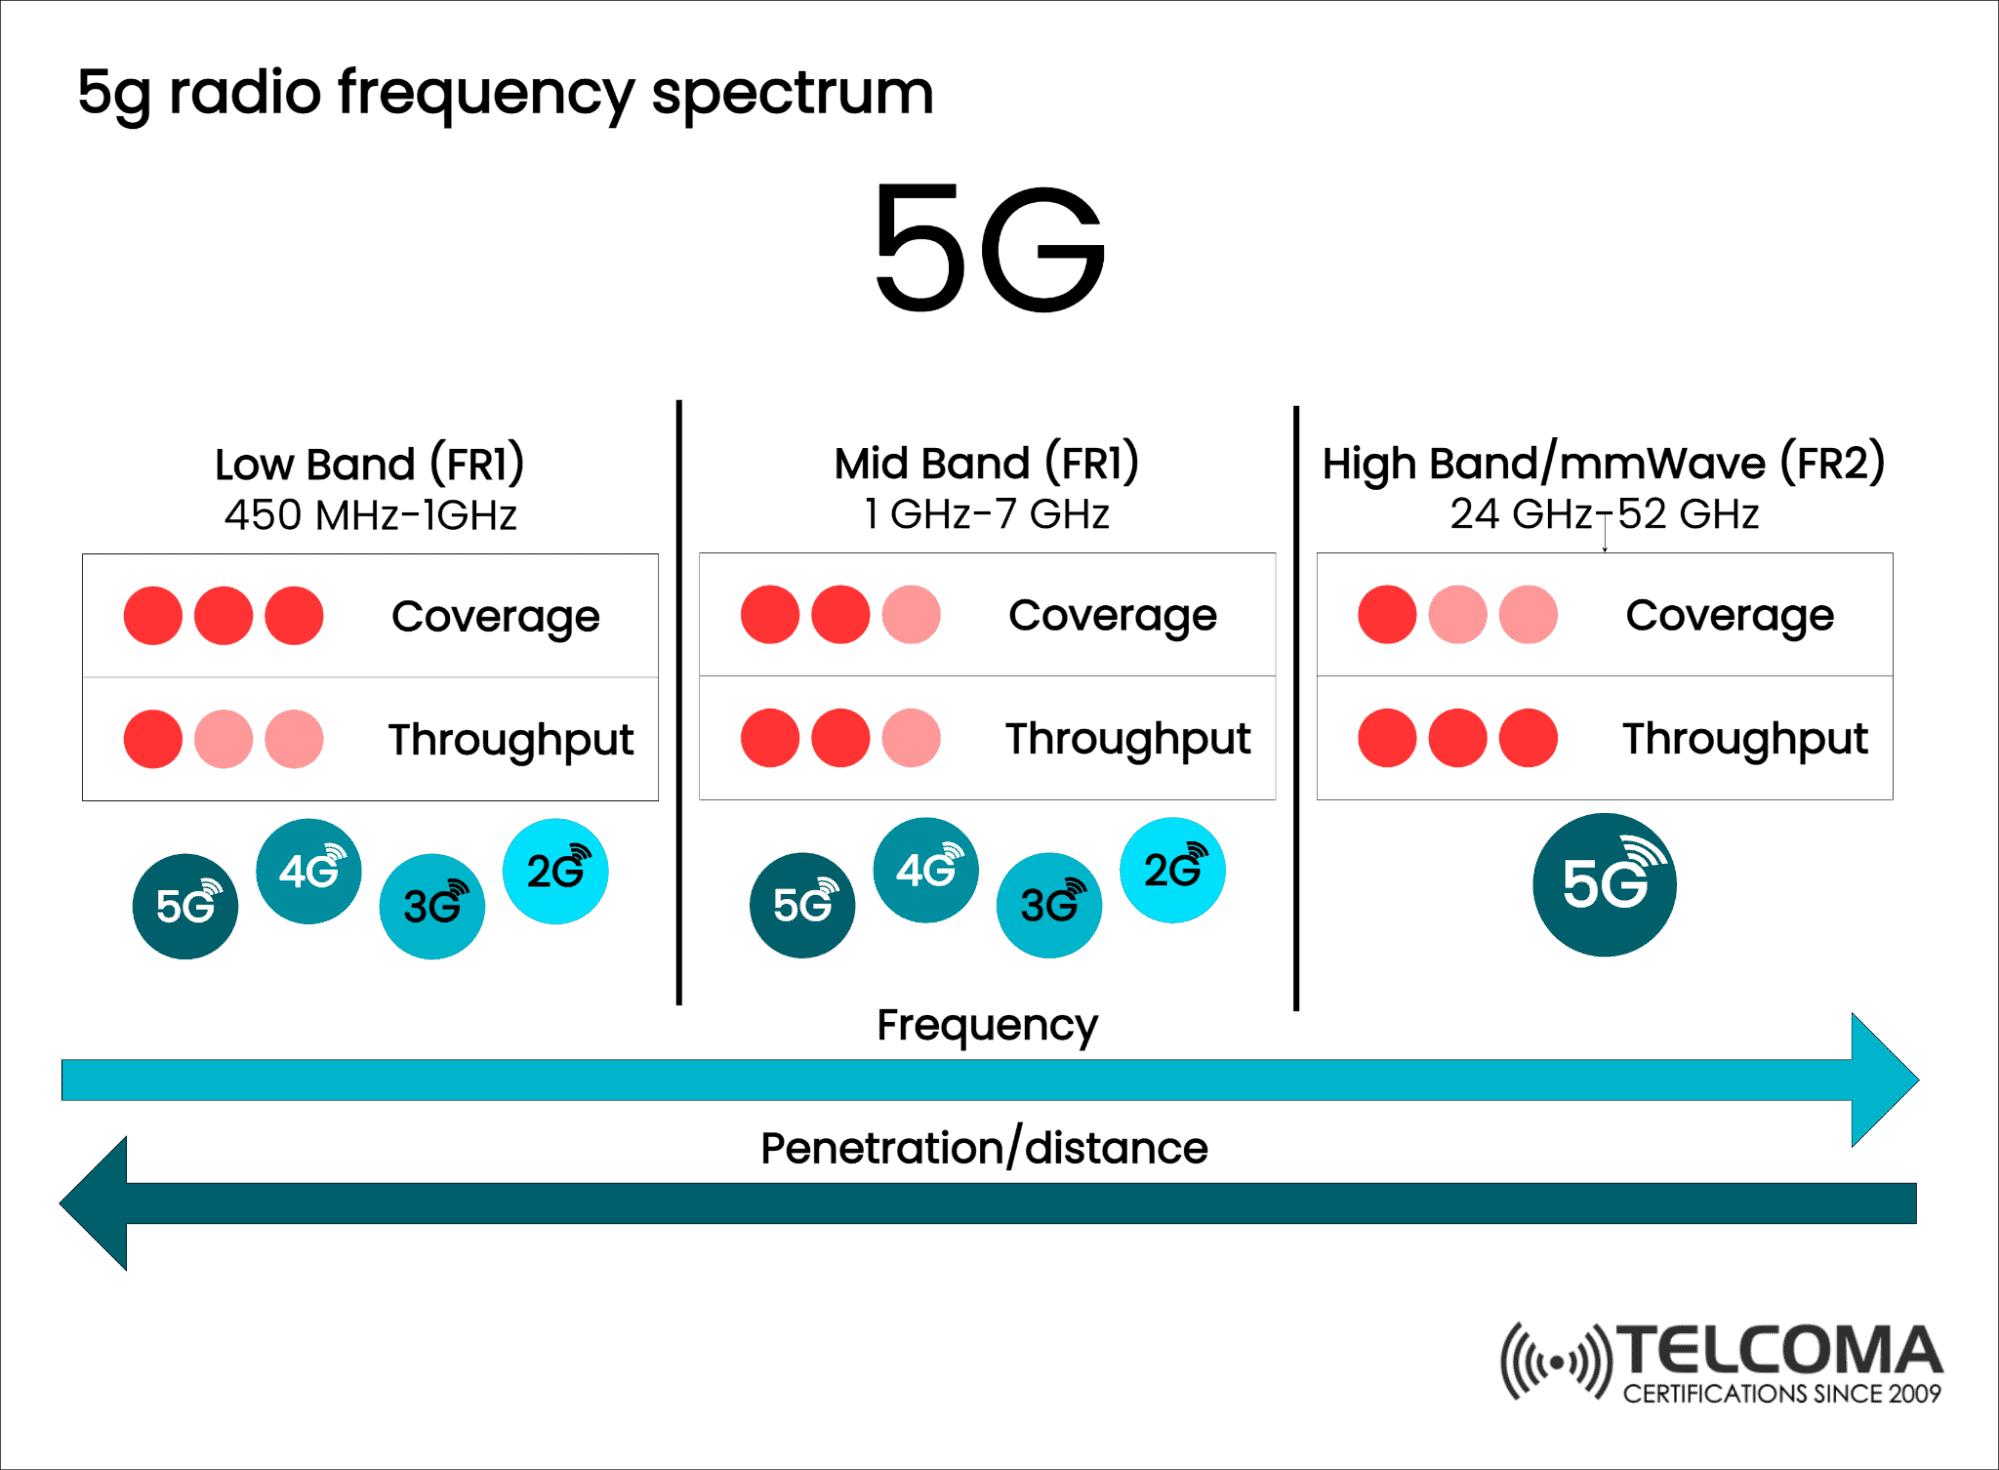 5g radio frequency spectrum